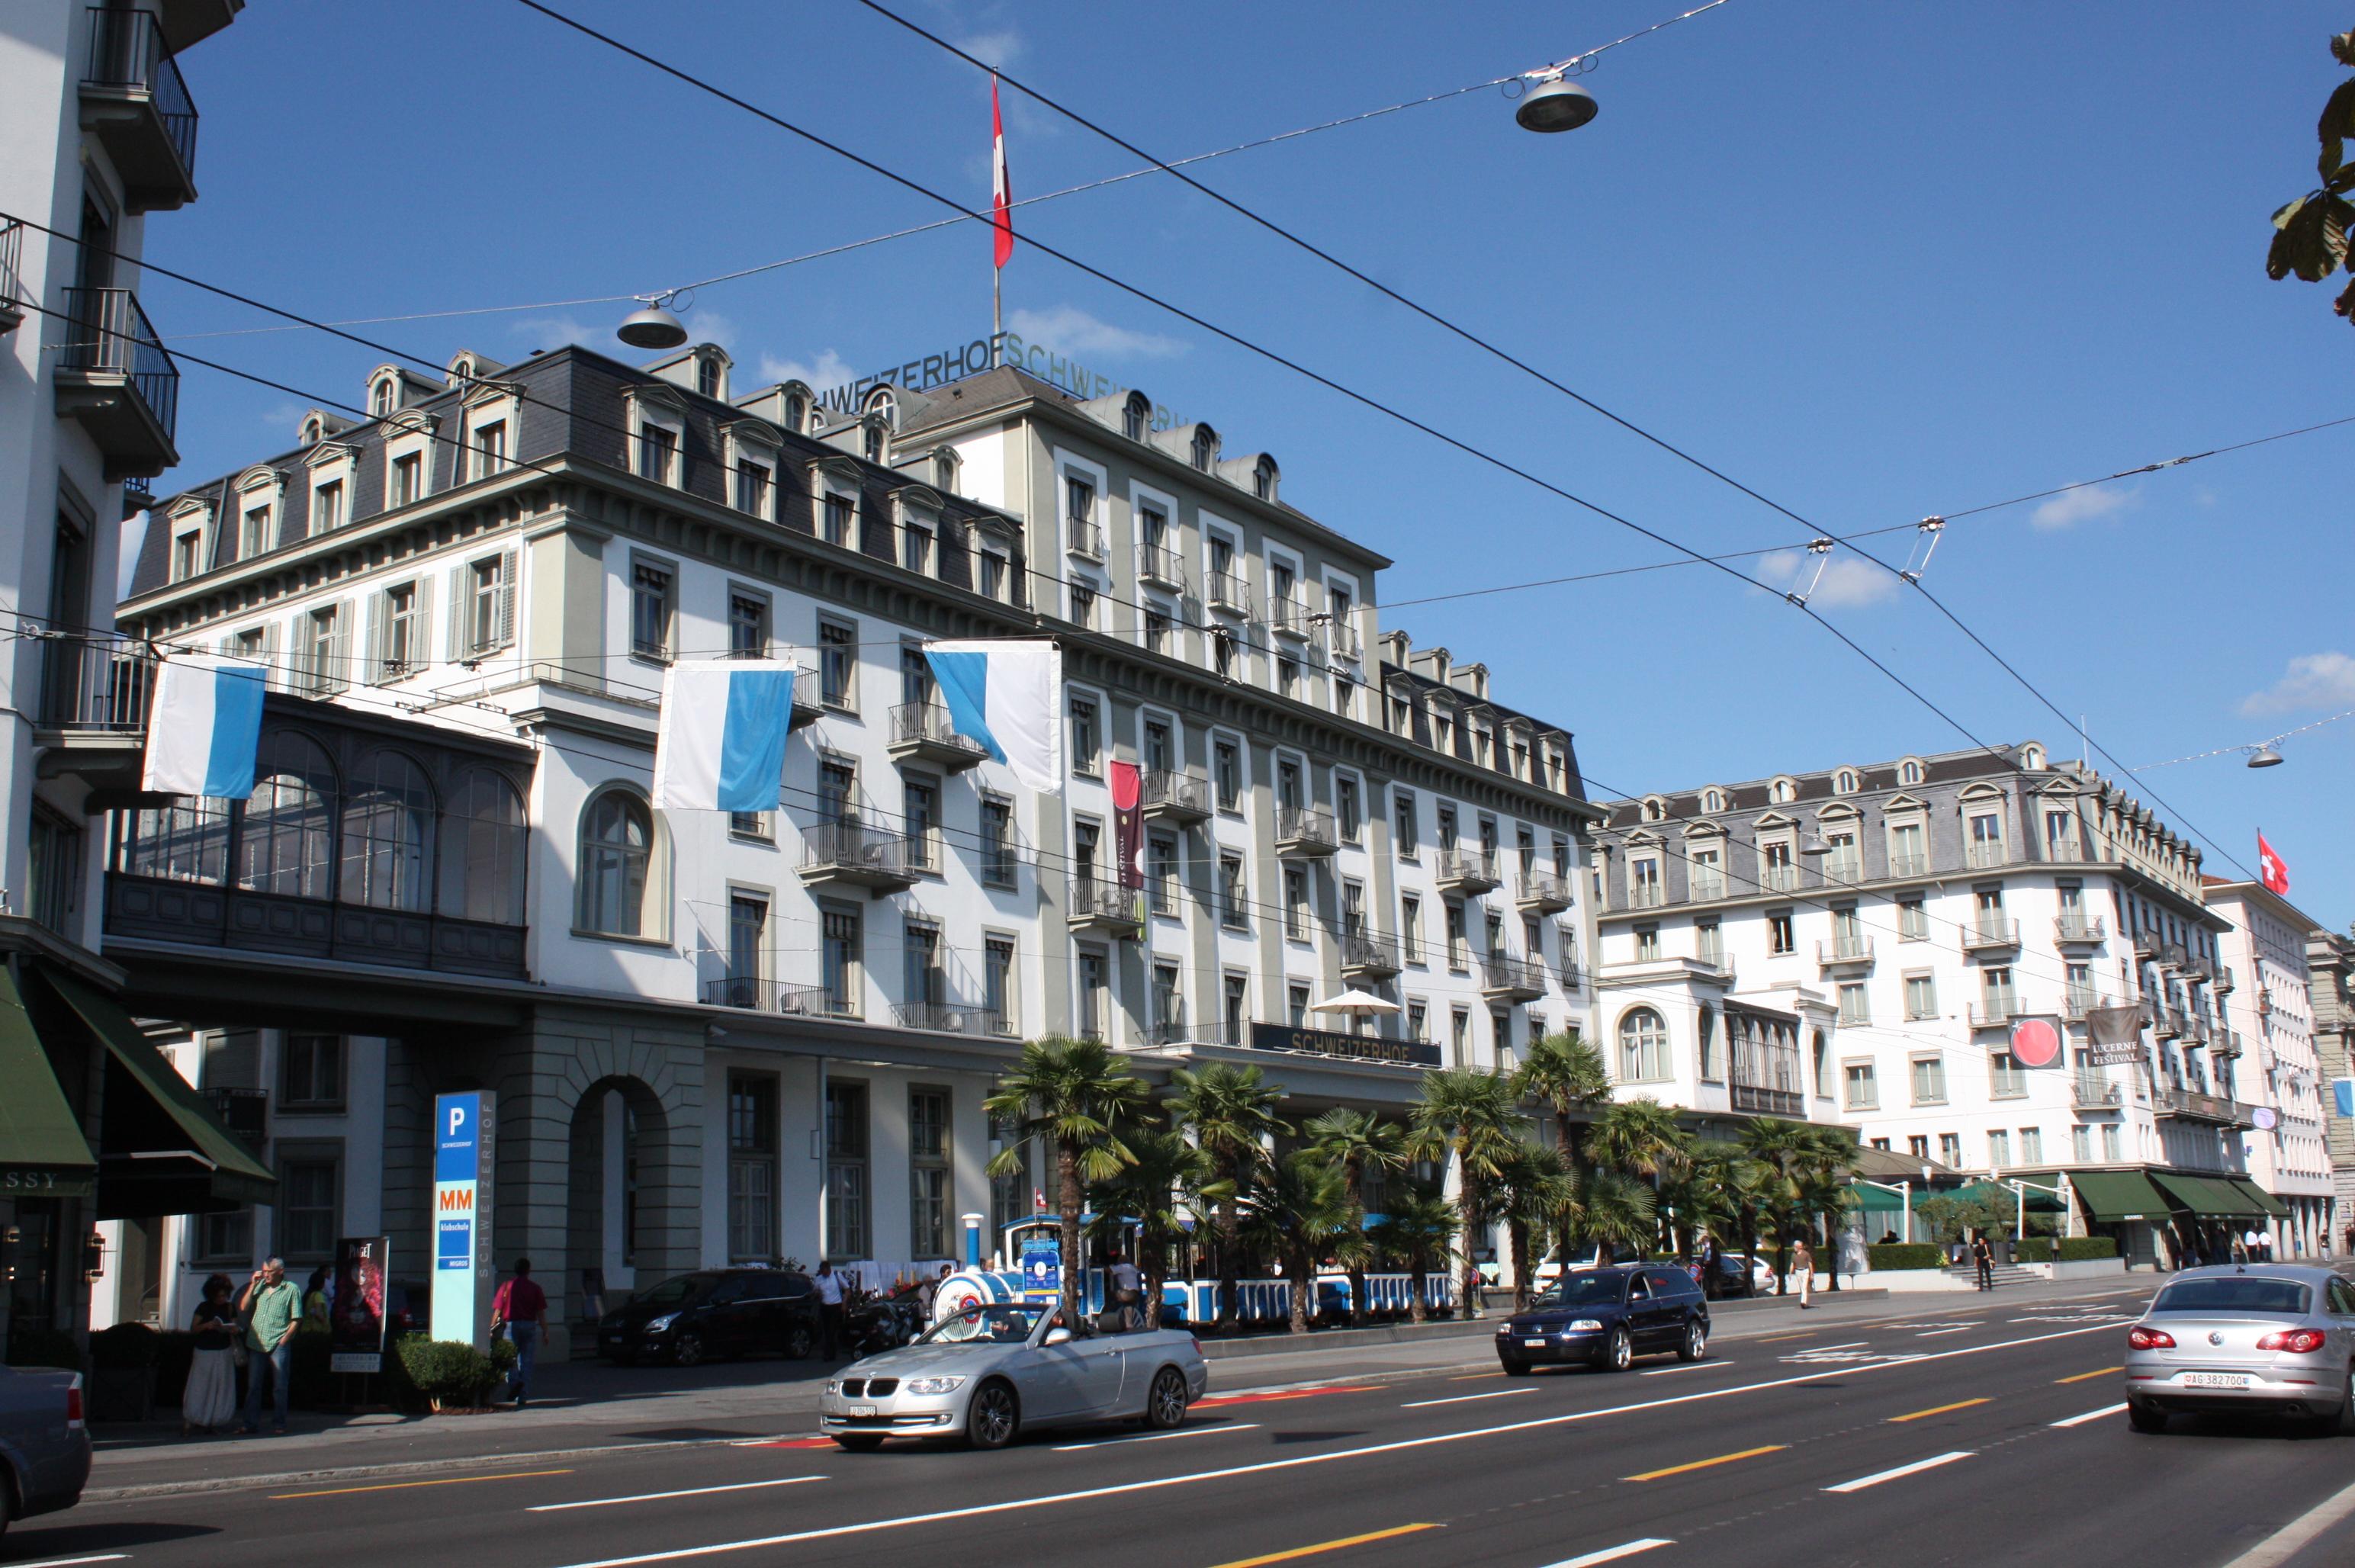 Hotel In Luzern Nahe Bahnhof